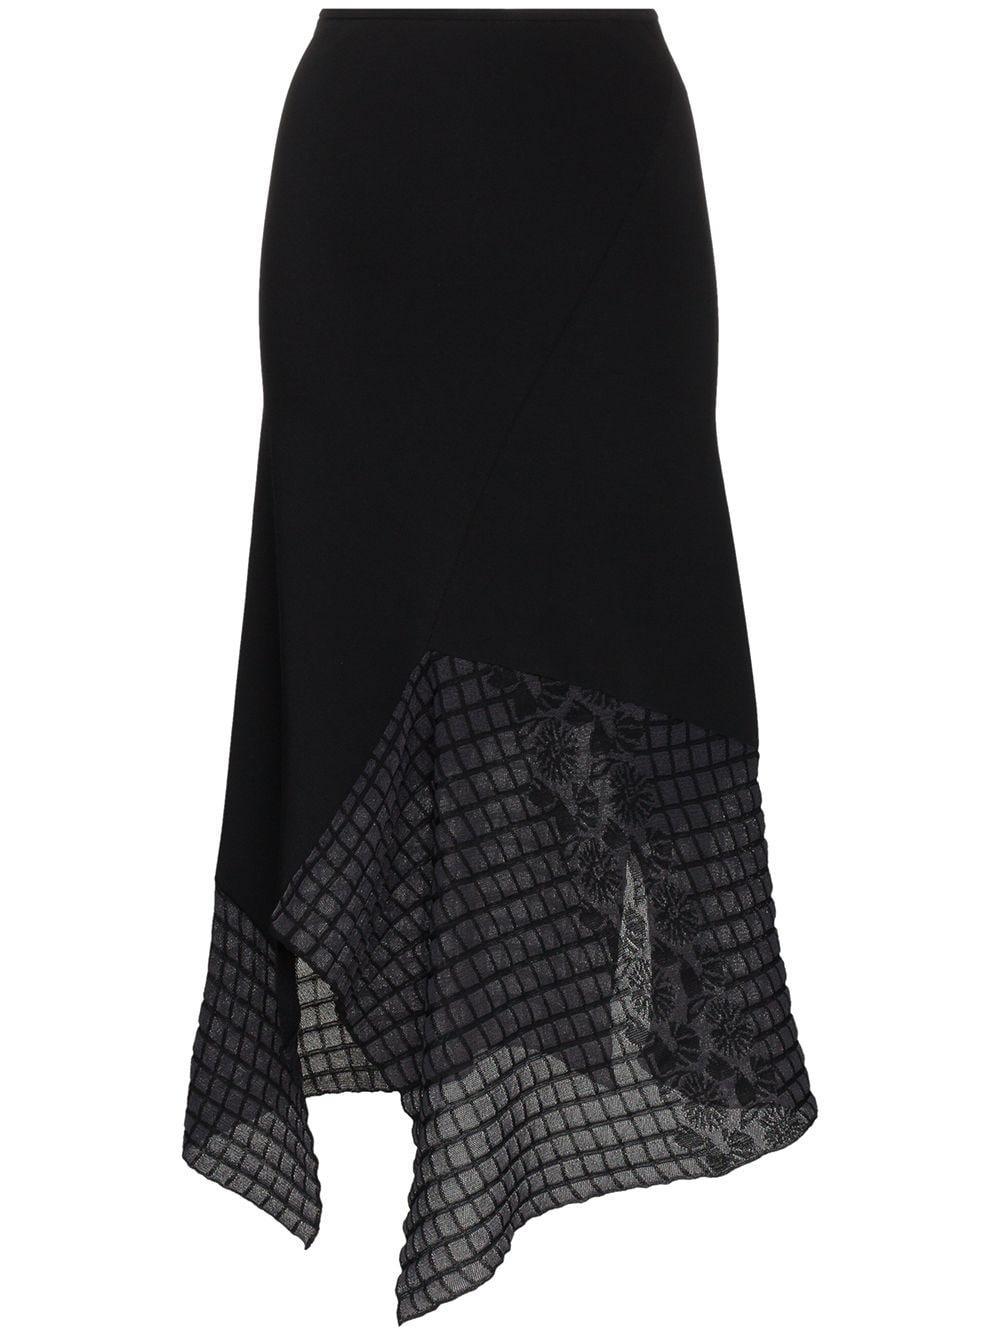 Roland Mouret Loda asymmetric midi skirt